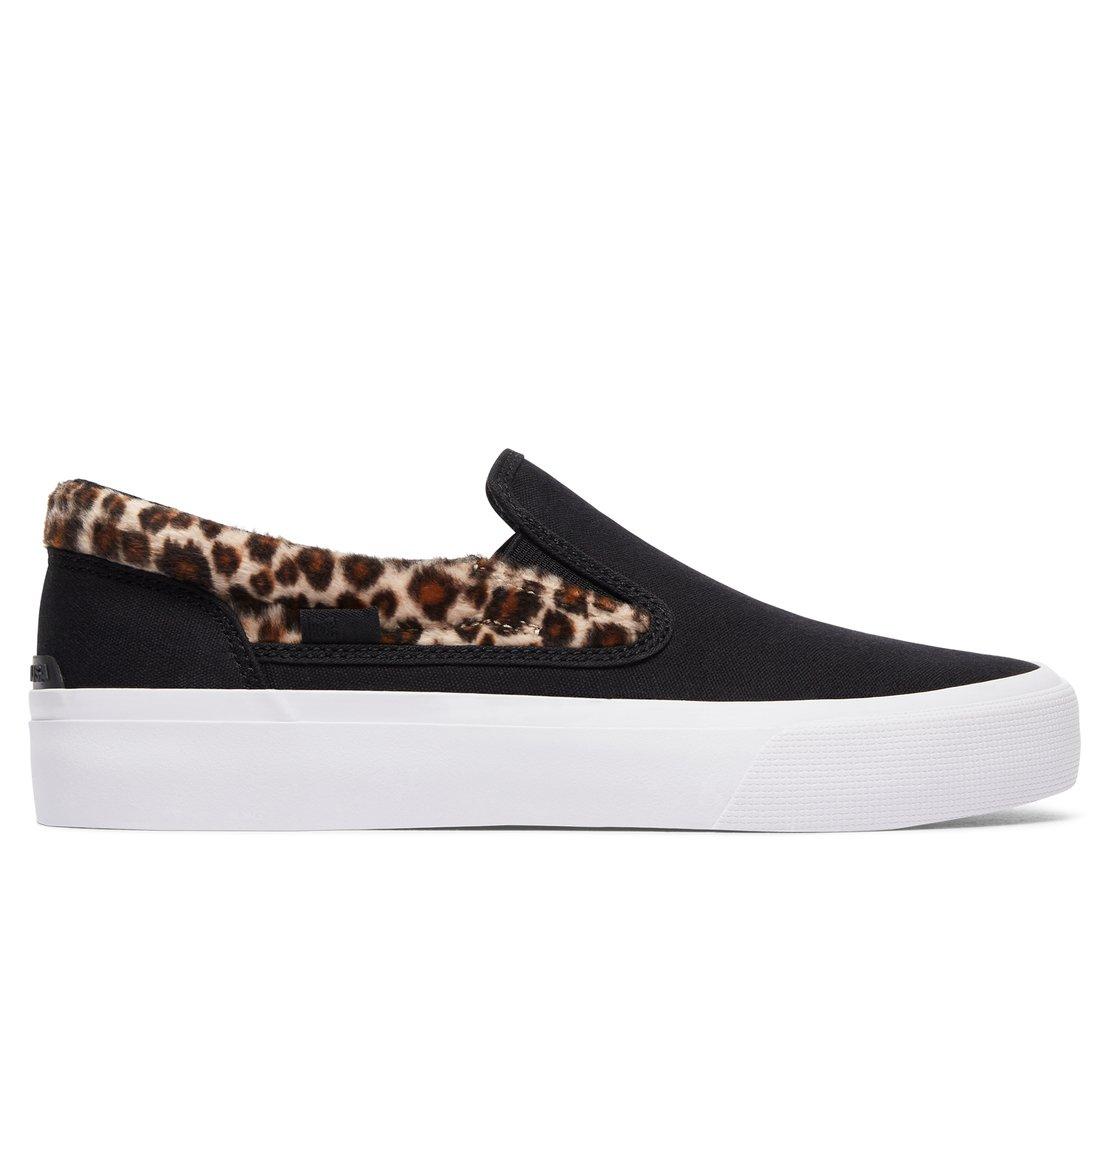 Negro (Negbas/Ftwbla/Plamet) Zapatos beige DC Shoes Trase para mujer  Blanco (Marshmallow)  39 EU 9pNr5g7Ta